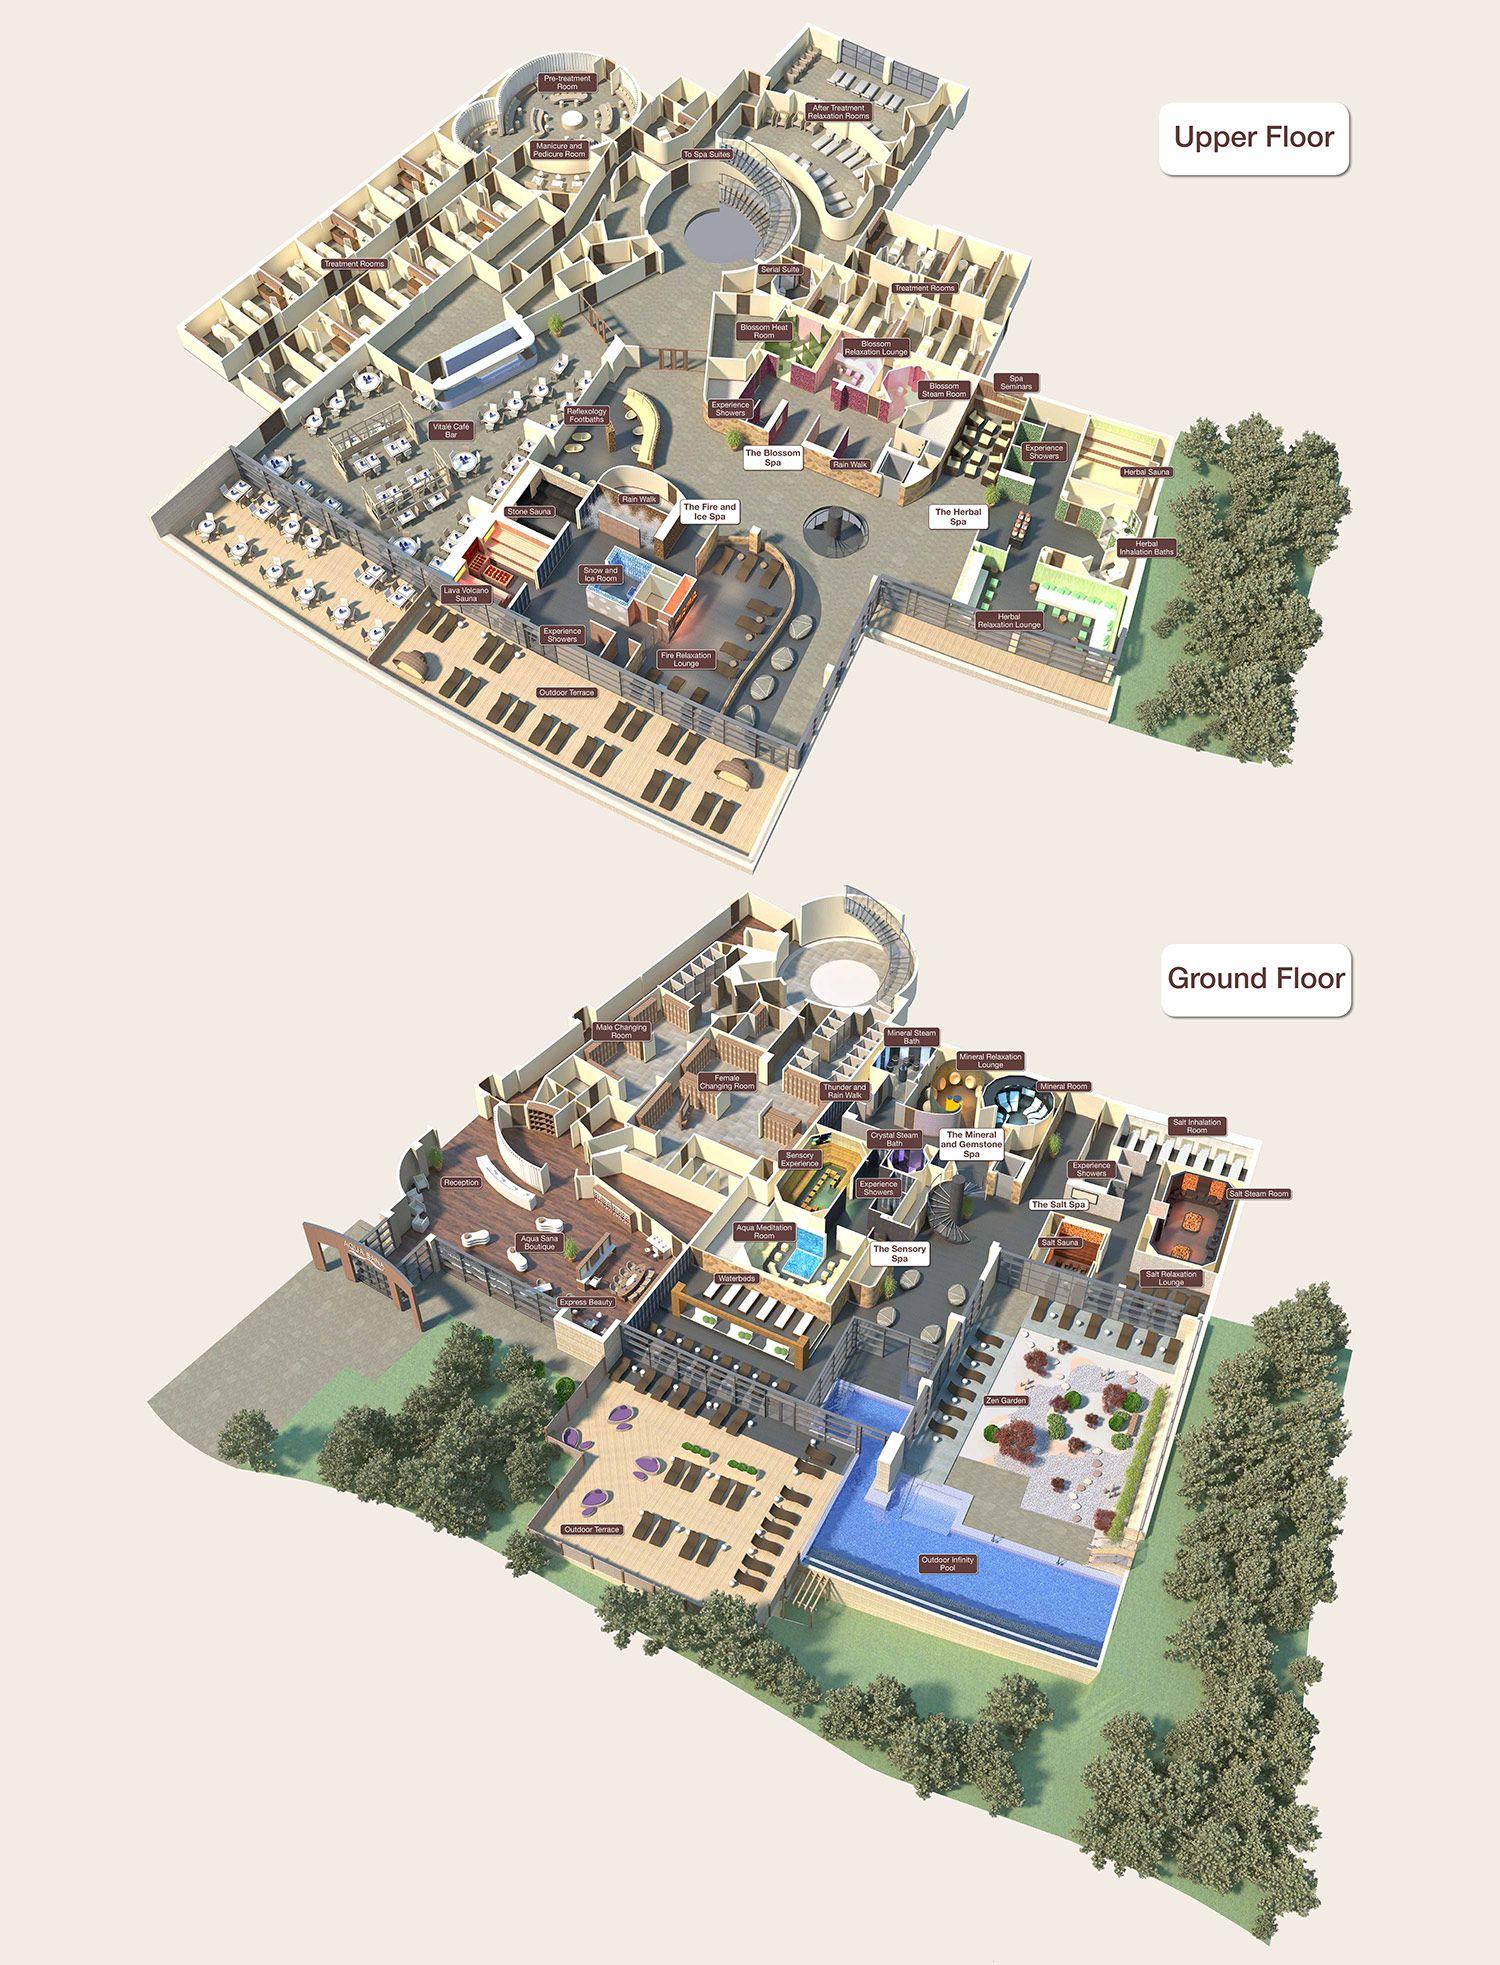 Floorplan at Woburn Forest  Center Parcs  Aqua Sana  Pinterest